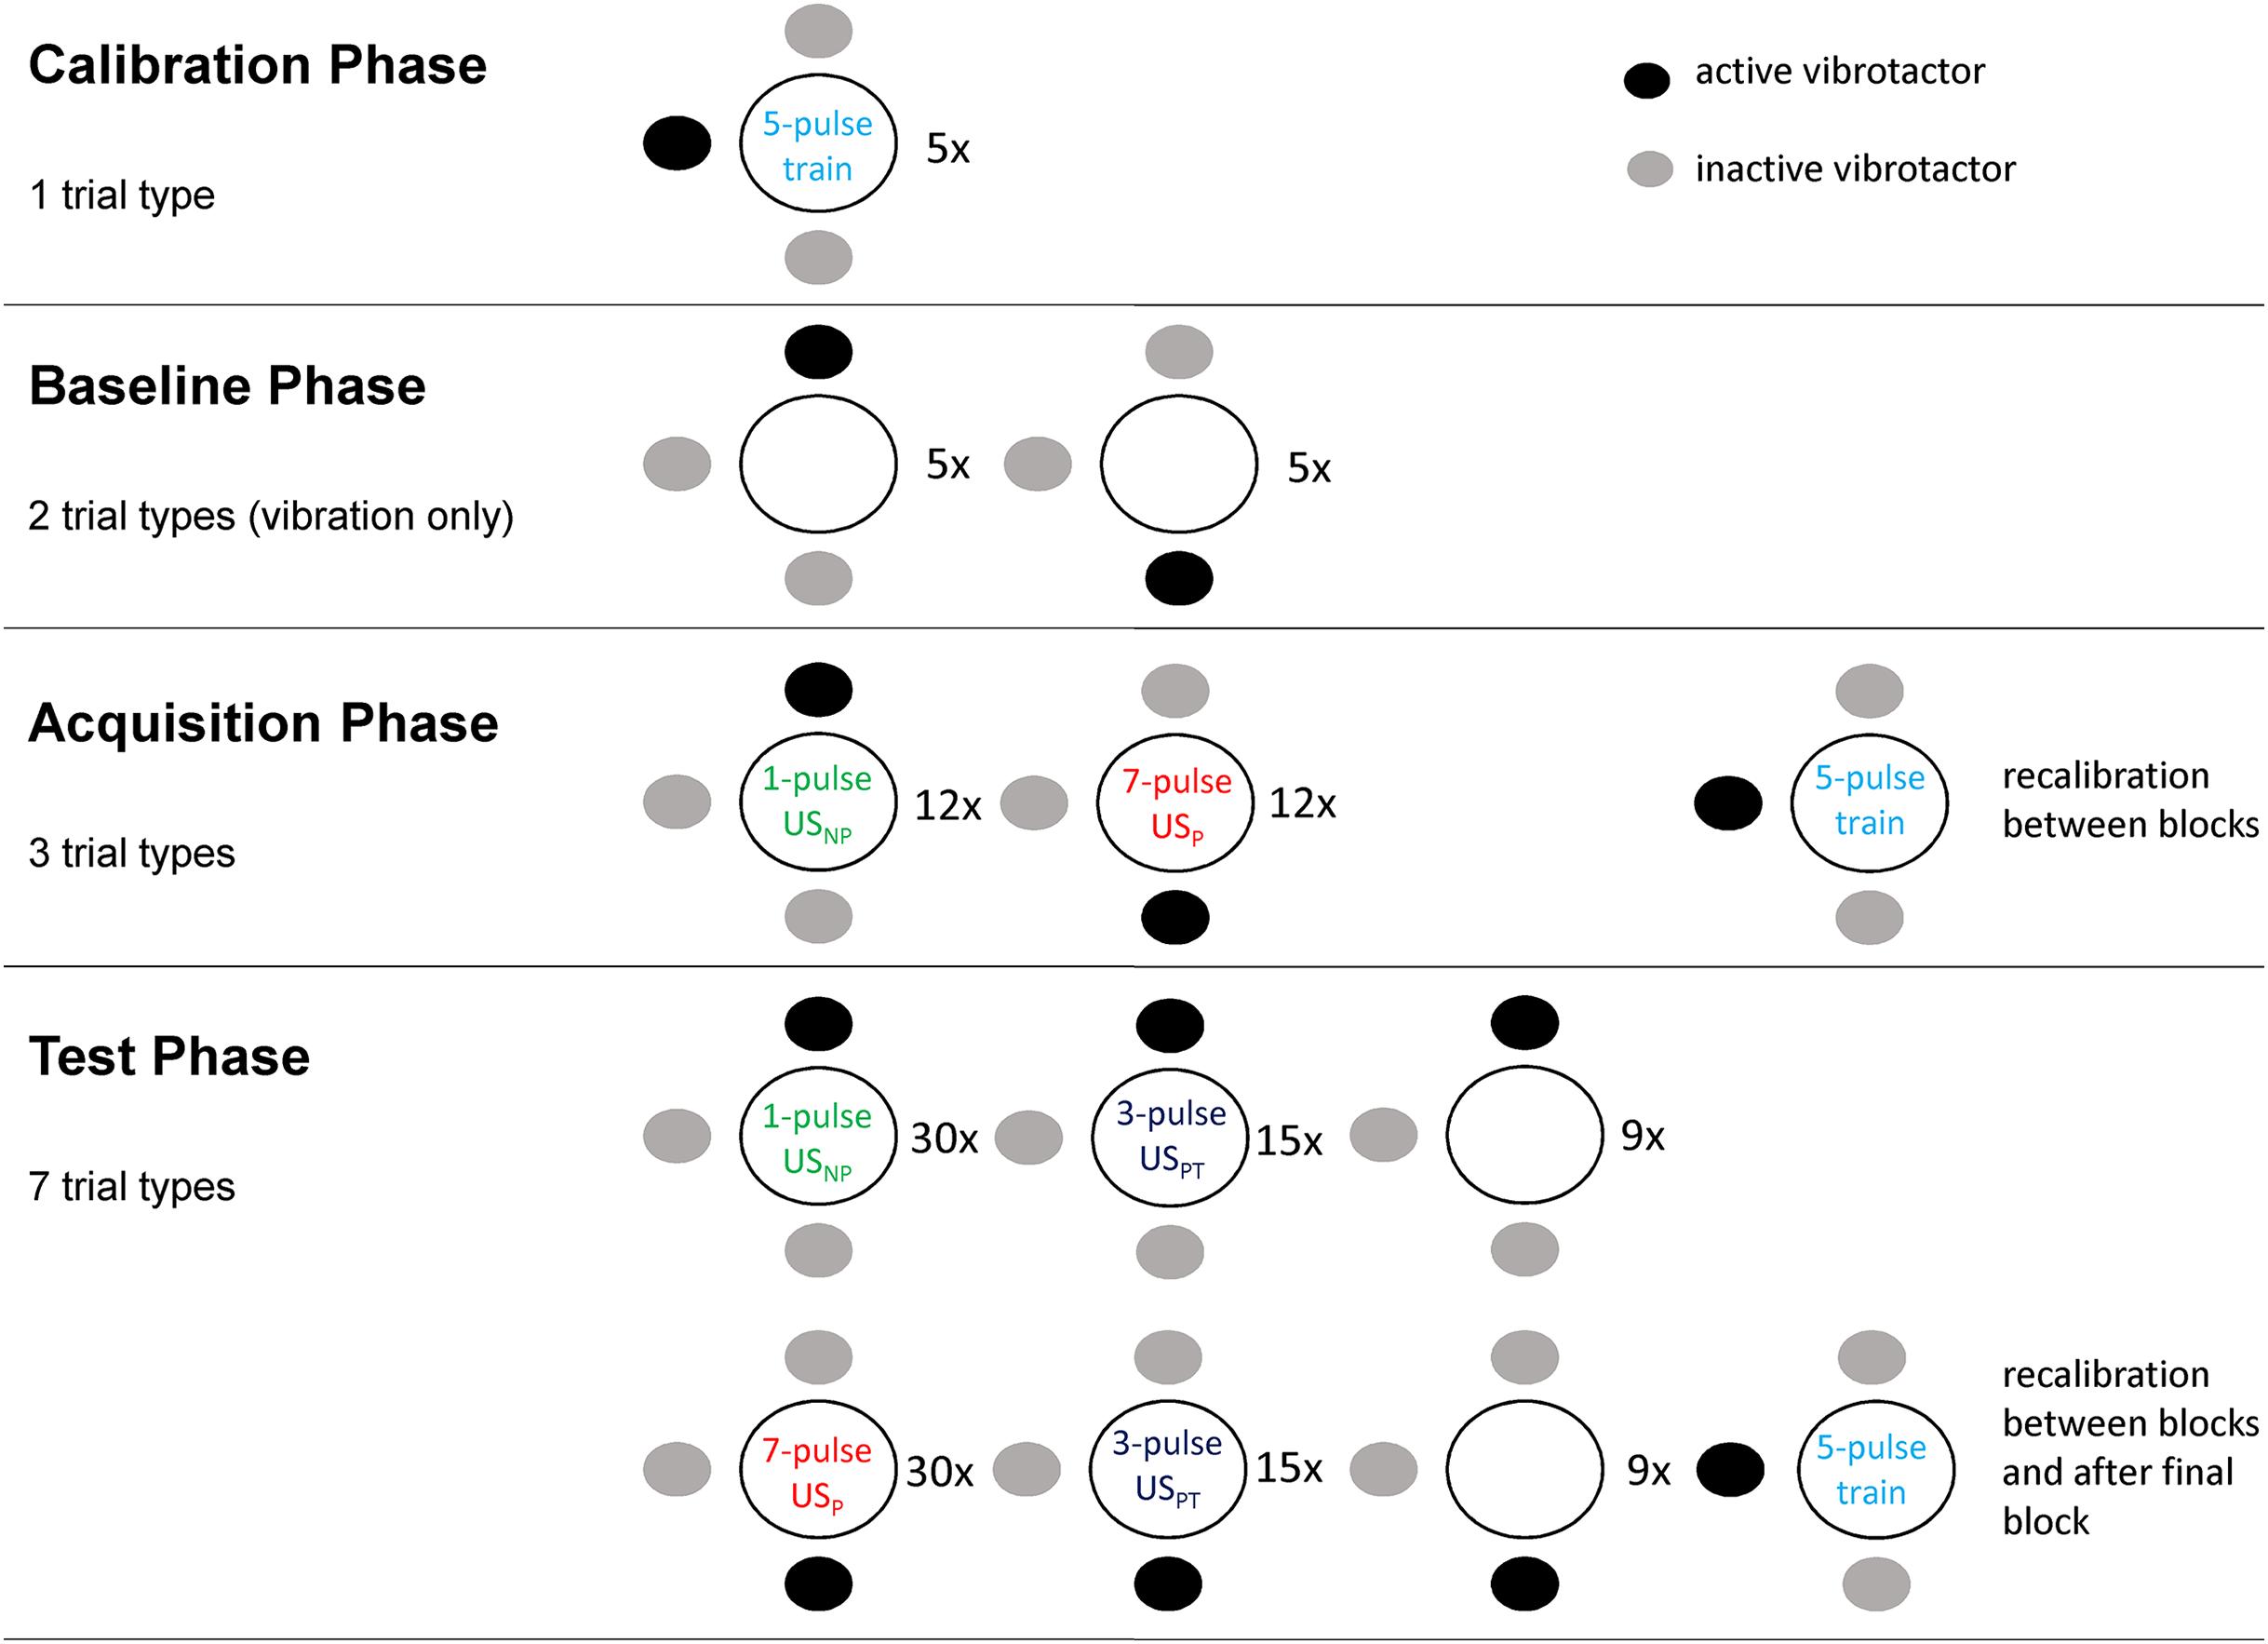 Modulating pain thresholds through classical conditioning [PeerJ]